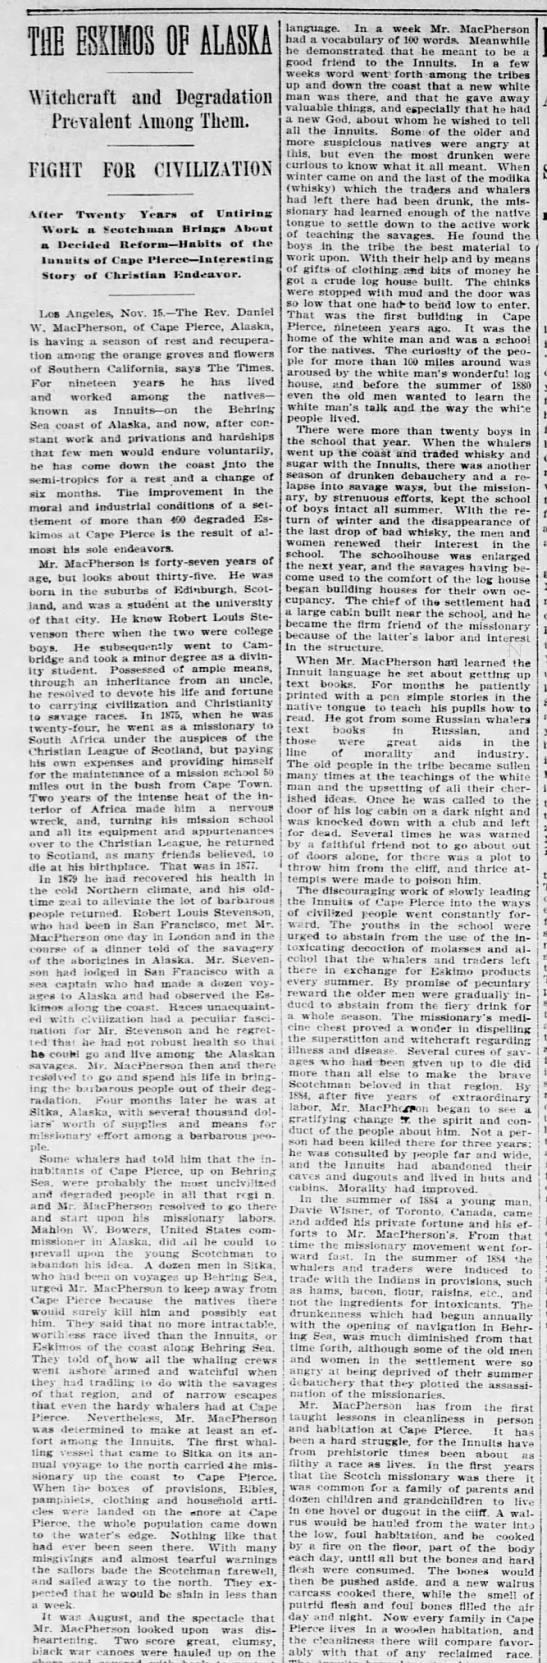 morning times, dc, 27 nov 1898